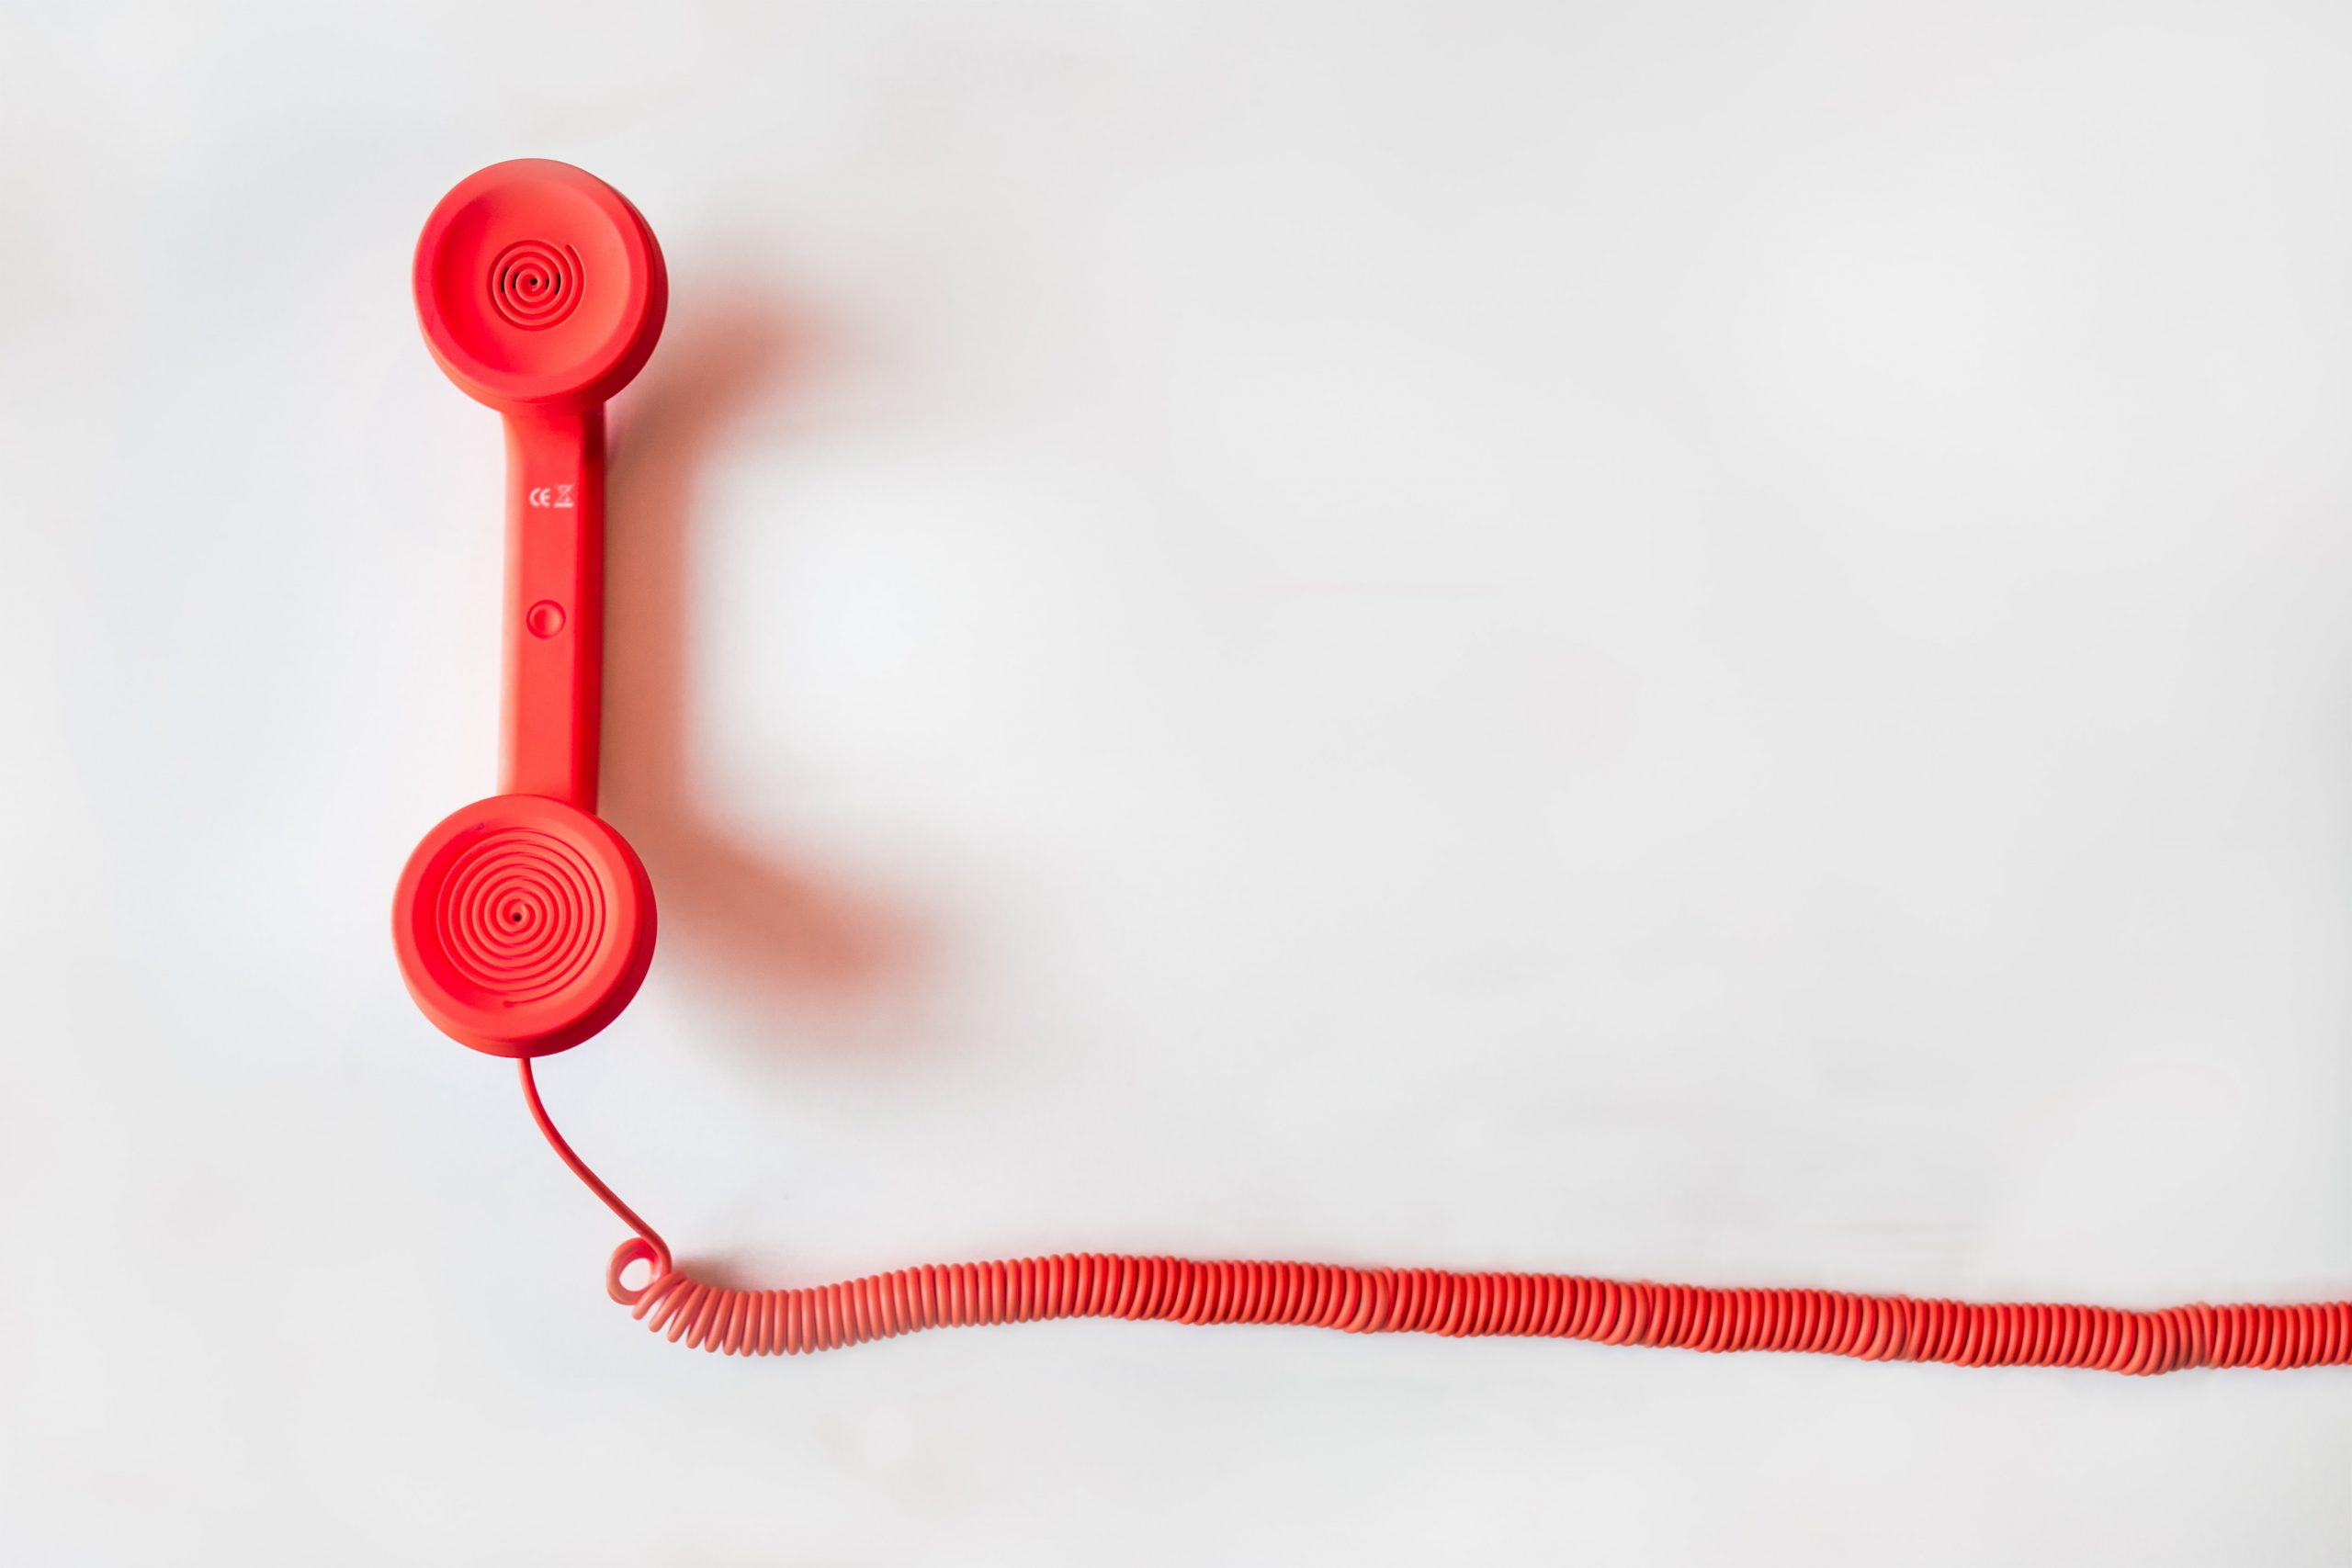 Telephone Red Telemarketing